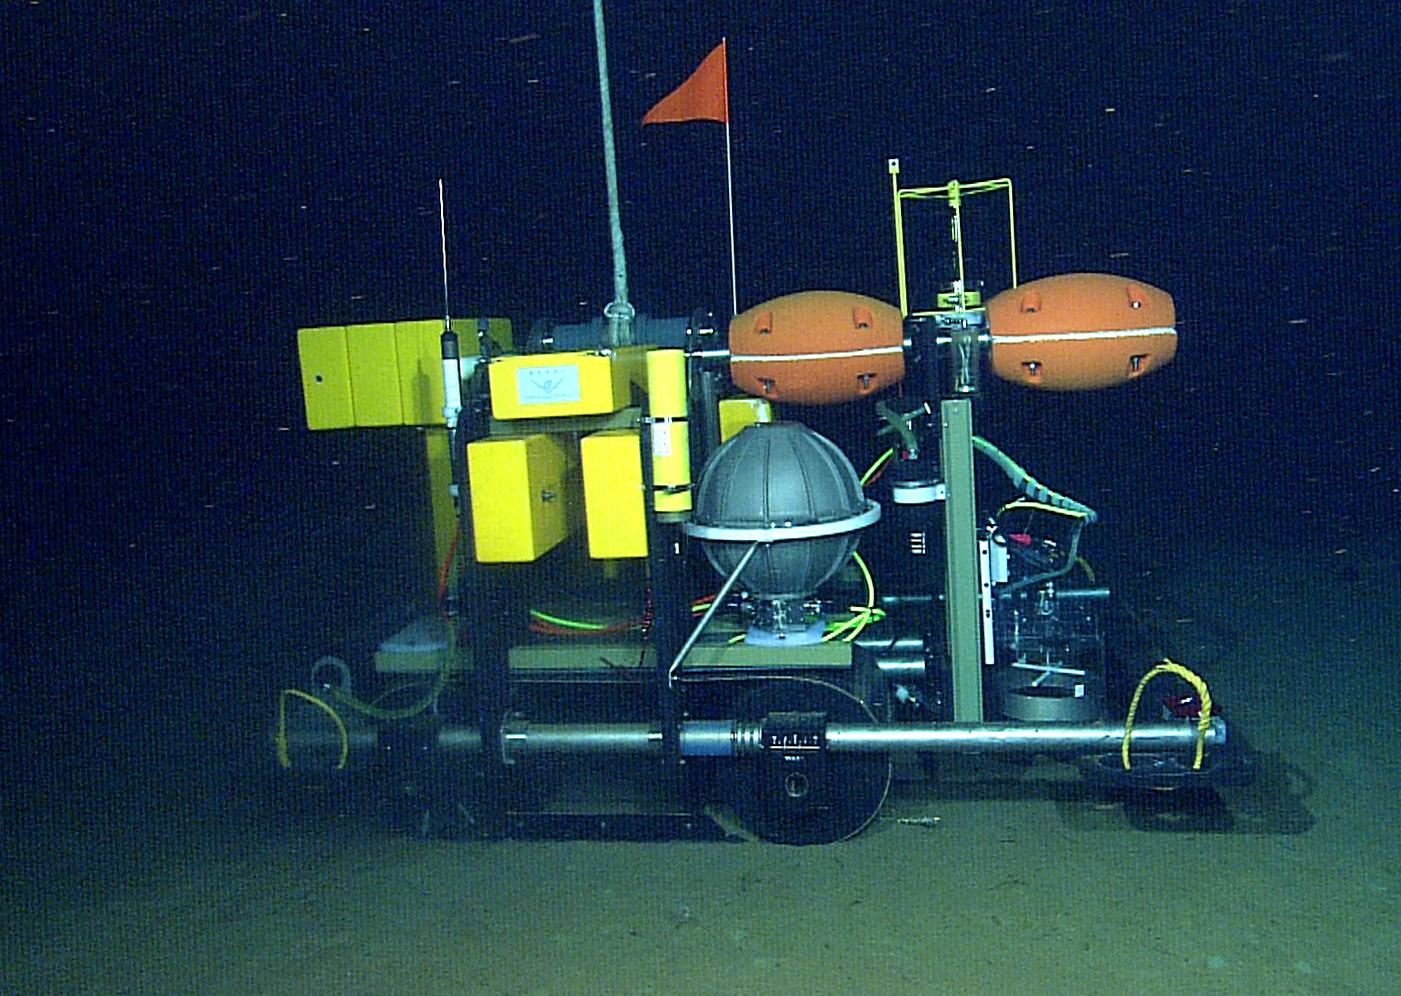 Benthic Rover